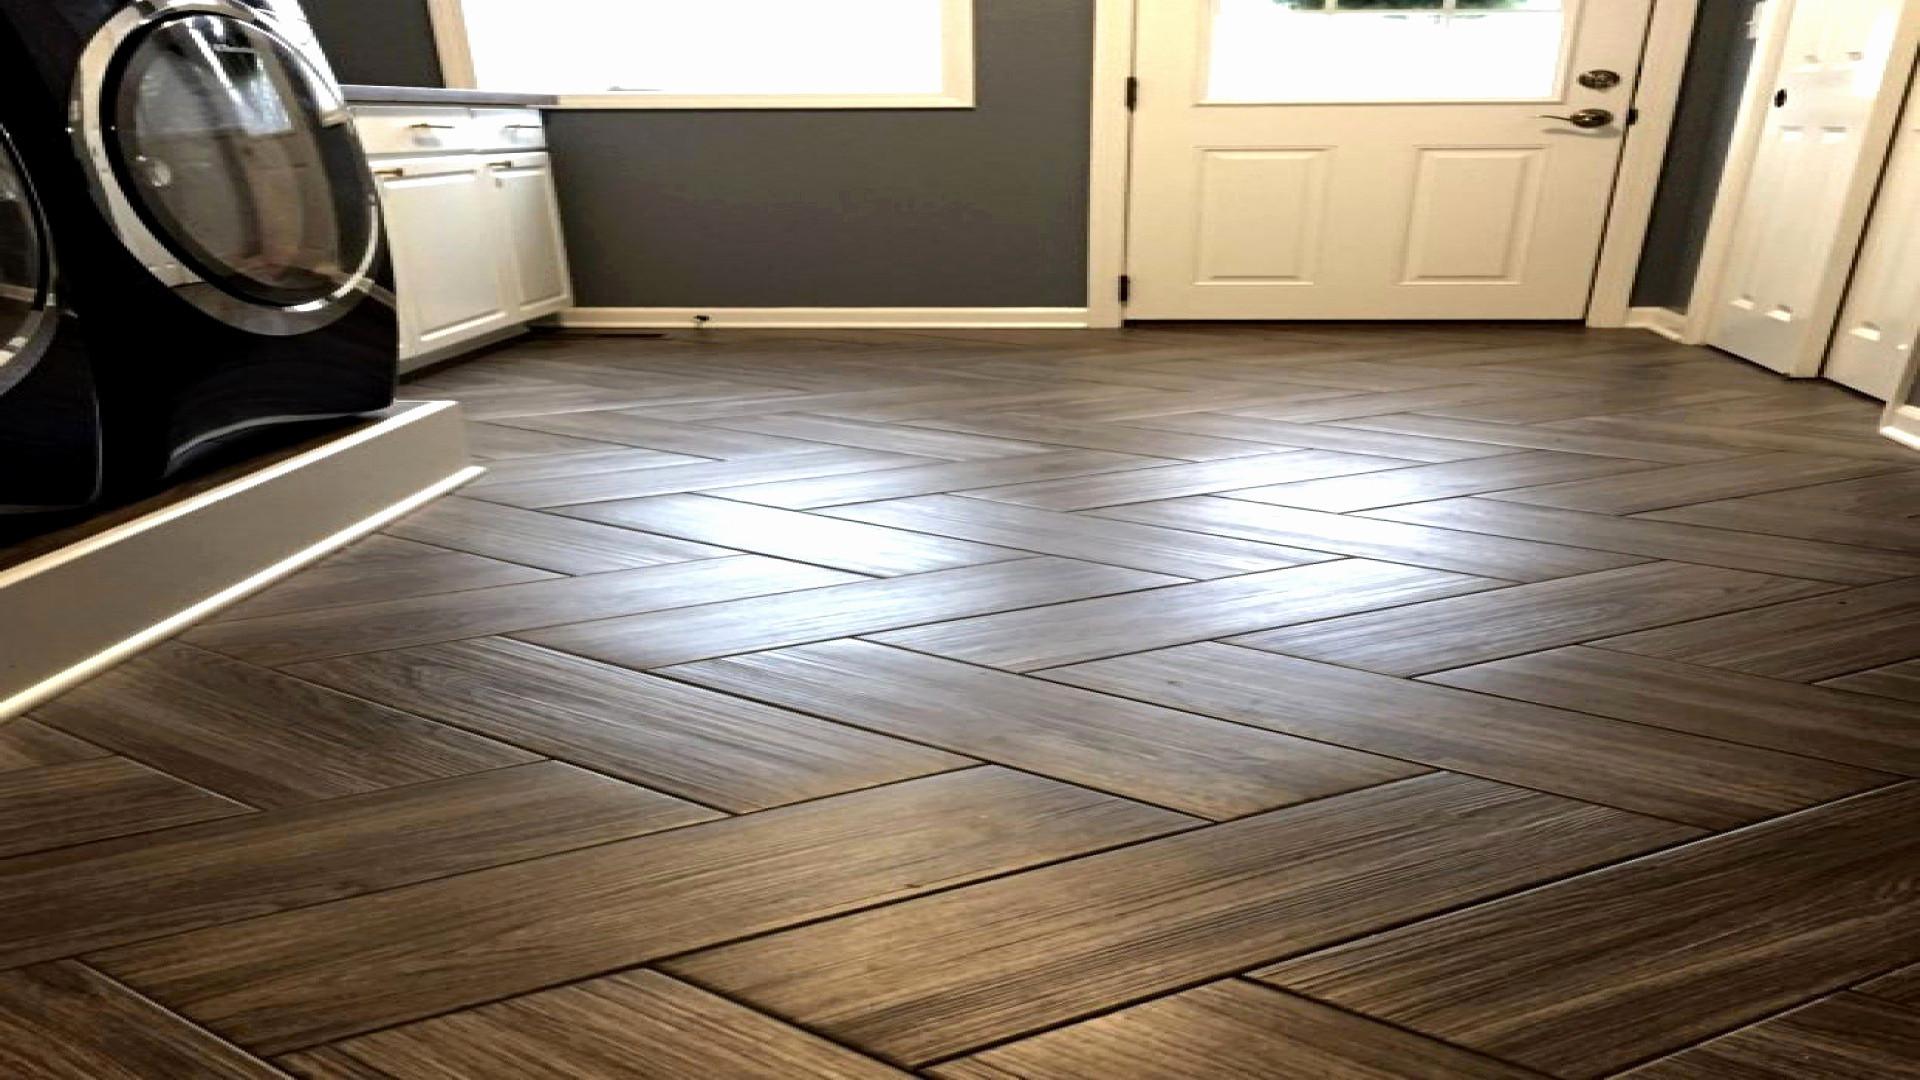 tile hardwood floor patterns of glamorous wood tile kitchen at floor transition laminate to intended for glamorous wood tile kitchen at floor transition laminate to herringbone tile pattern